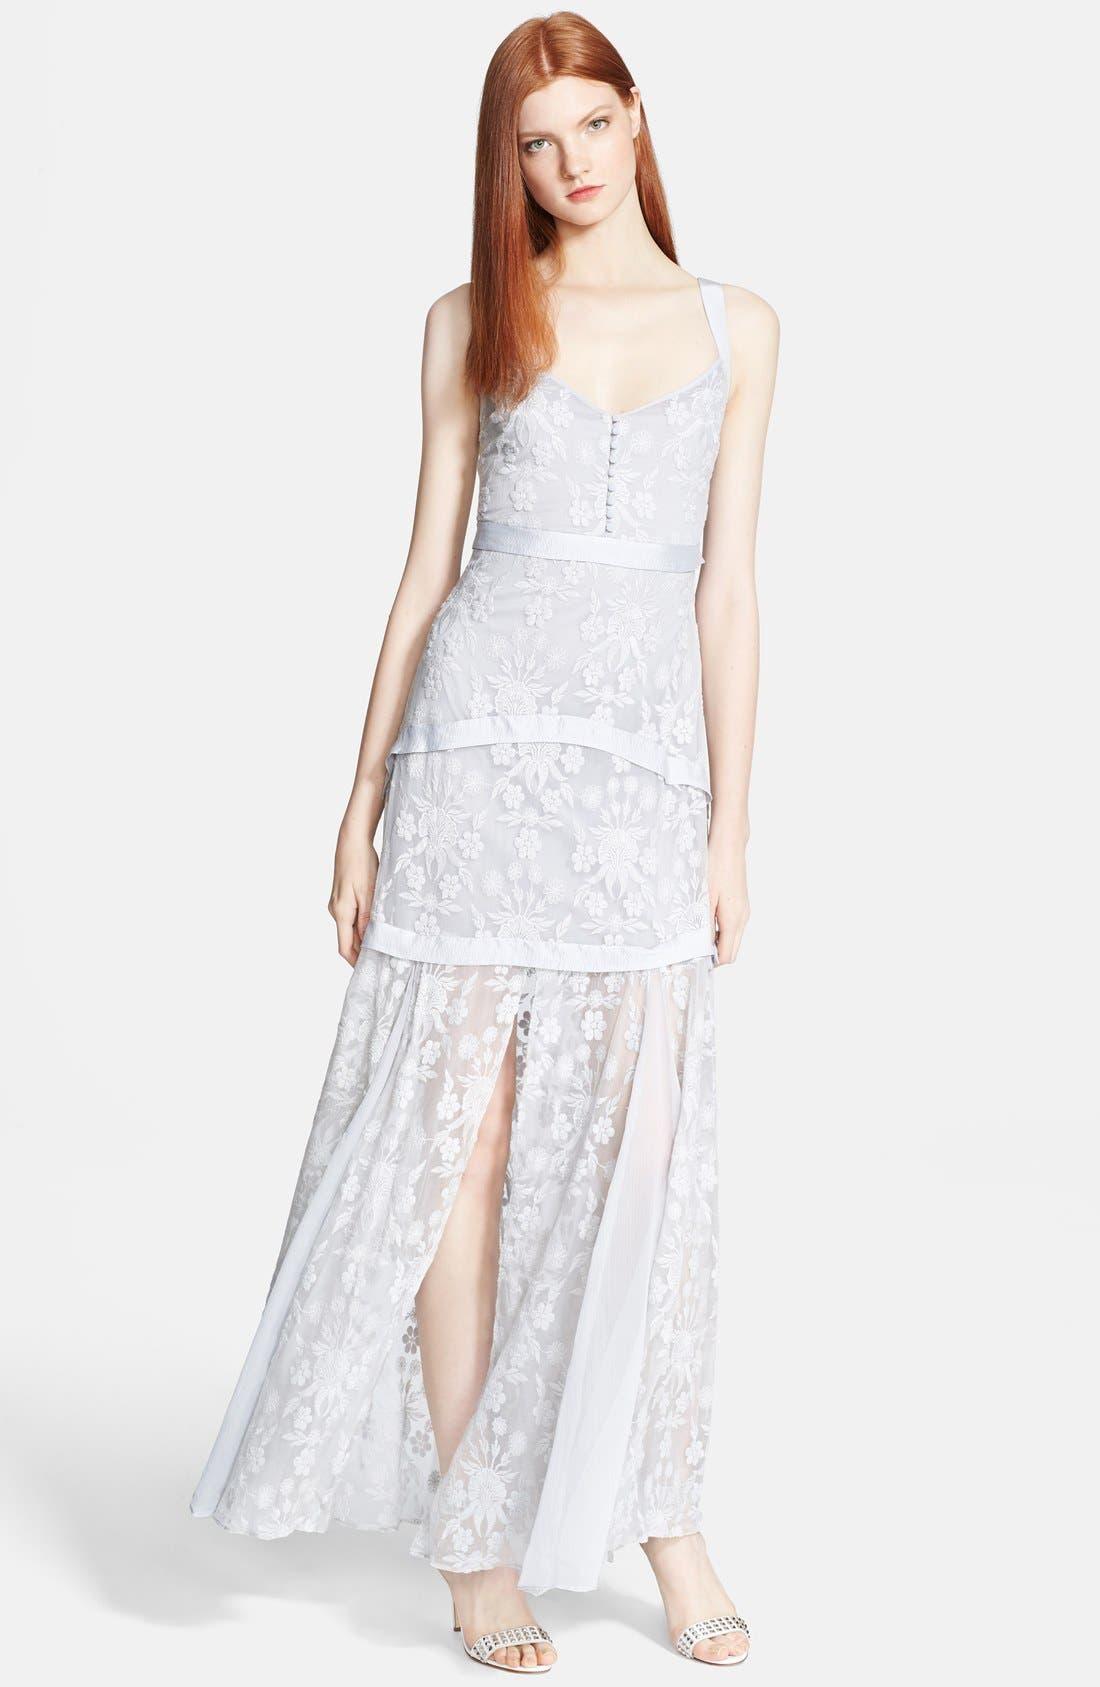 Alternate Image 1 Selected - Elizabeth and James 'Lise' Long Silk Lace Dress